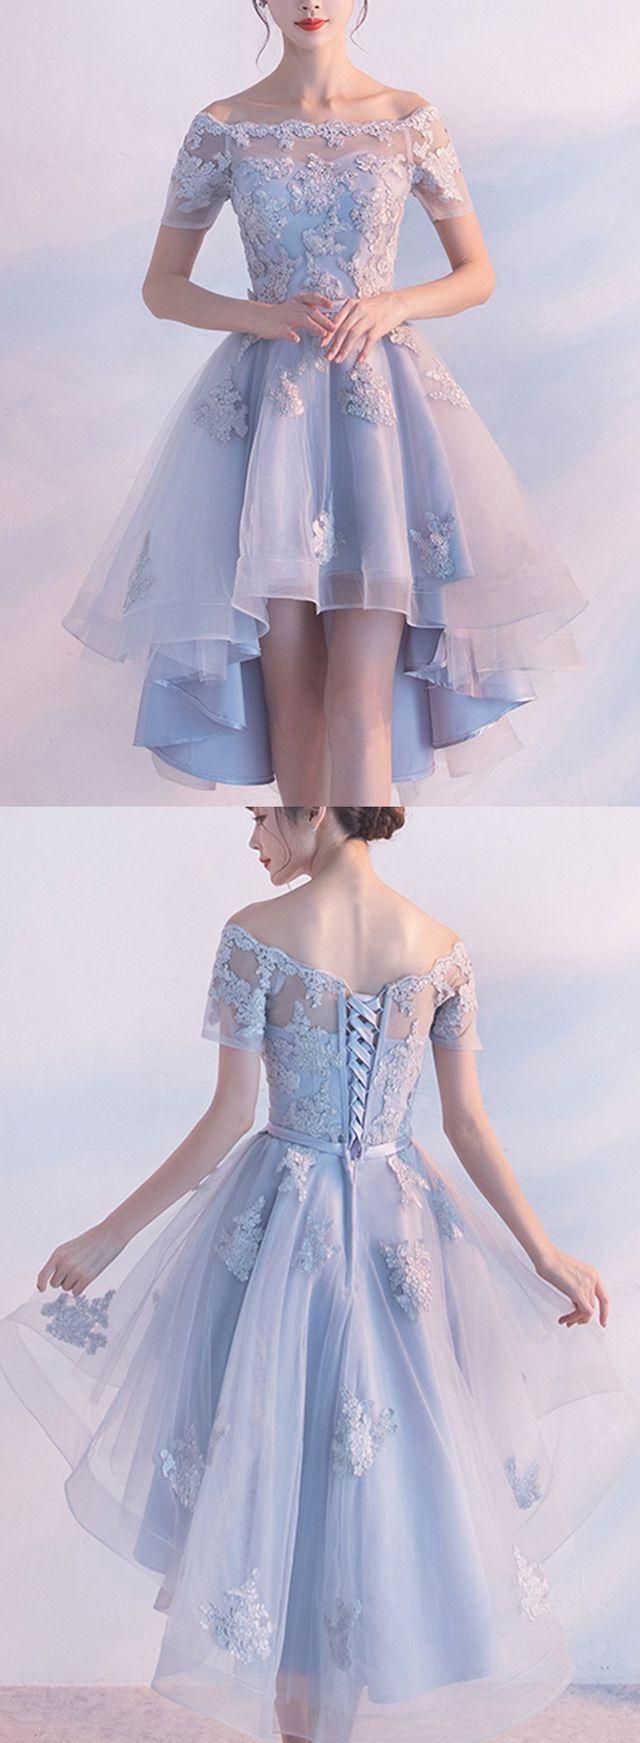 LIGHT BLUE PREETY DRESS